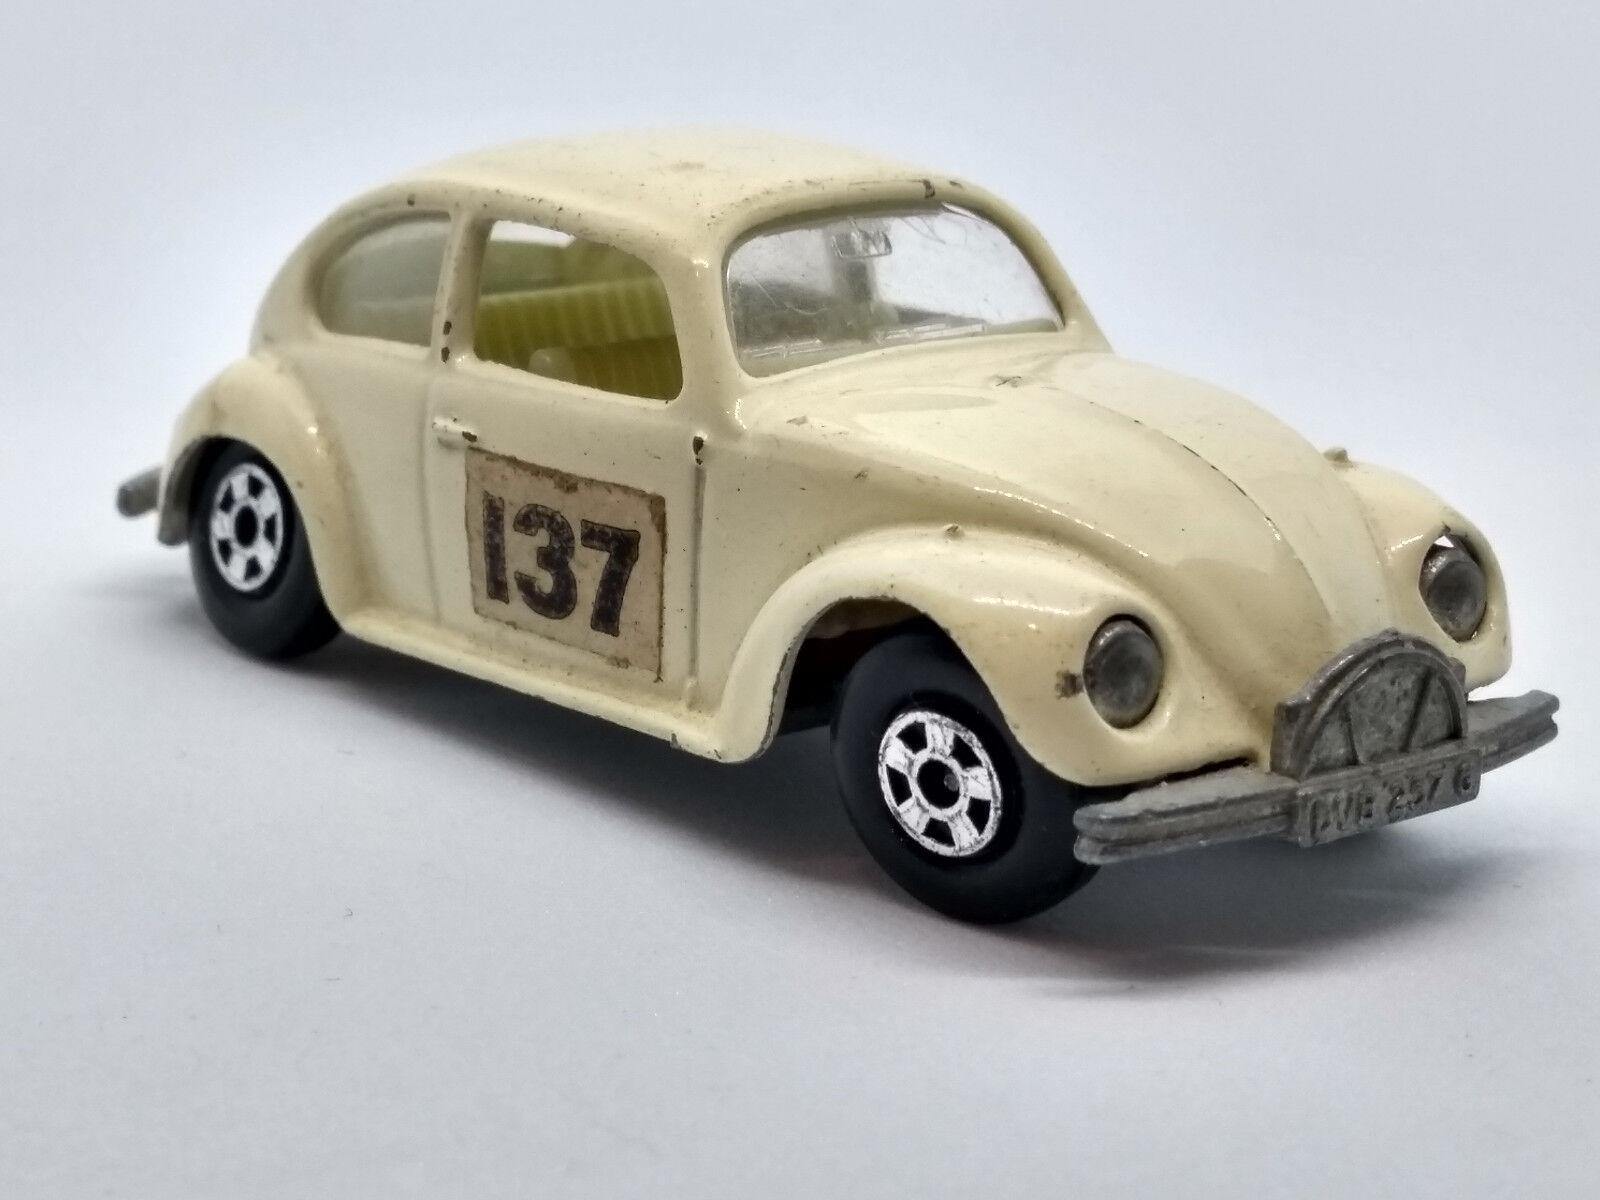 Matchbox, Vintage 1968, Series 15 Volkswagen Beetle 1500 Saloon, Diecast Toy Car